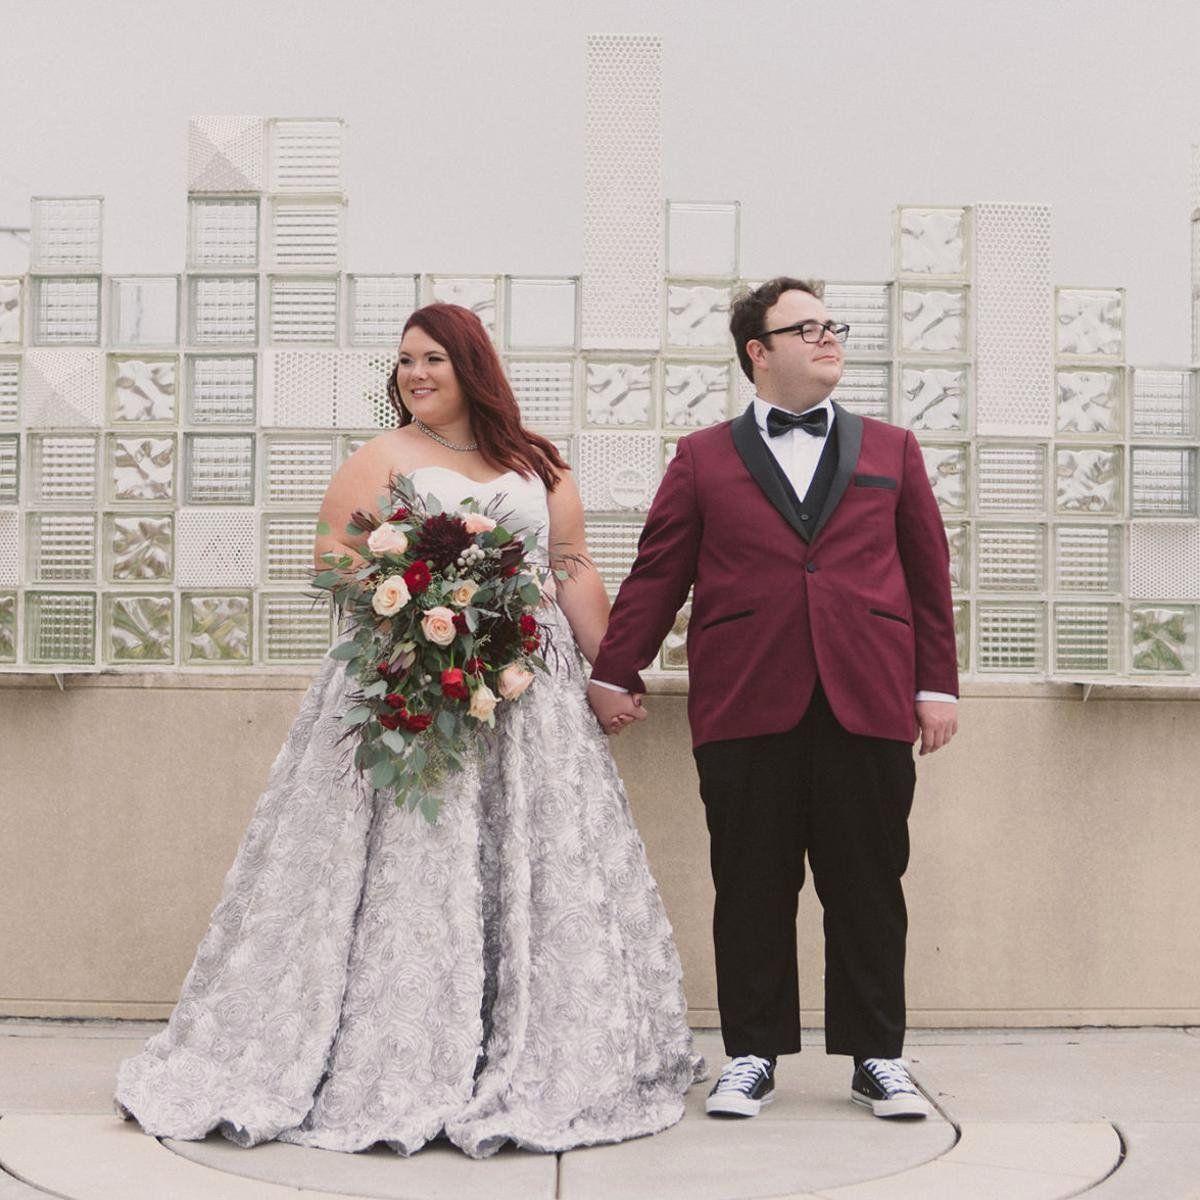 Design Your Own Wedding Dress App Best Of Ultimate Diy Bride Wedding Essentials In 2020 Wedding Dress Preservation Modern Wedding Dress Wedding Dresses